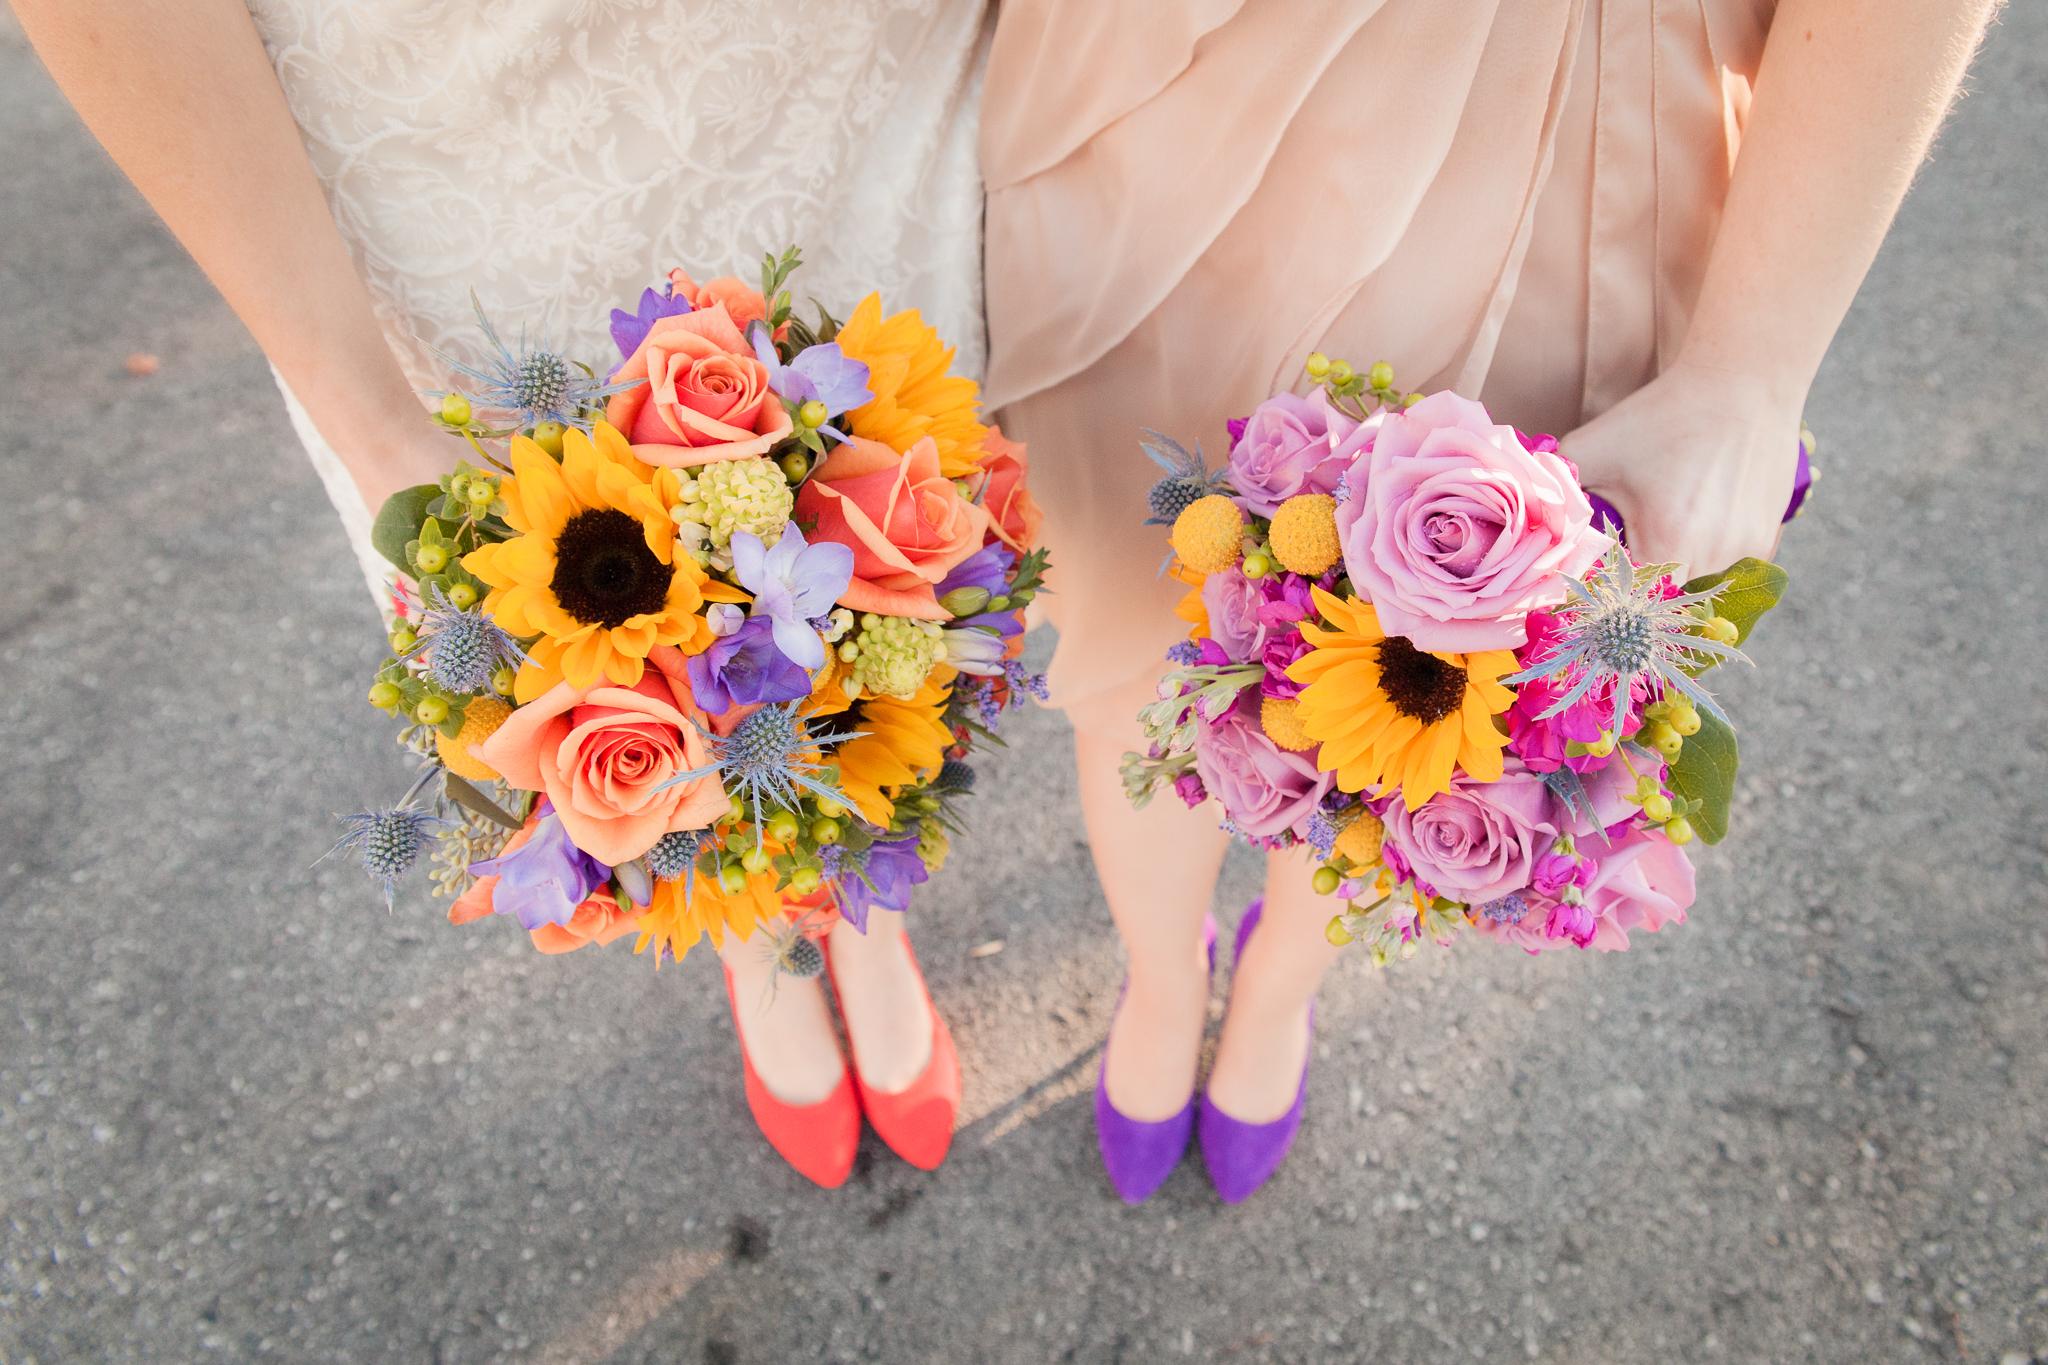 camuglia-whomstudio-chelsea_and_andy-nycphotographer-wedding-brooklyn-buffalo-timberlodge-033-0185.jpg